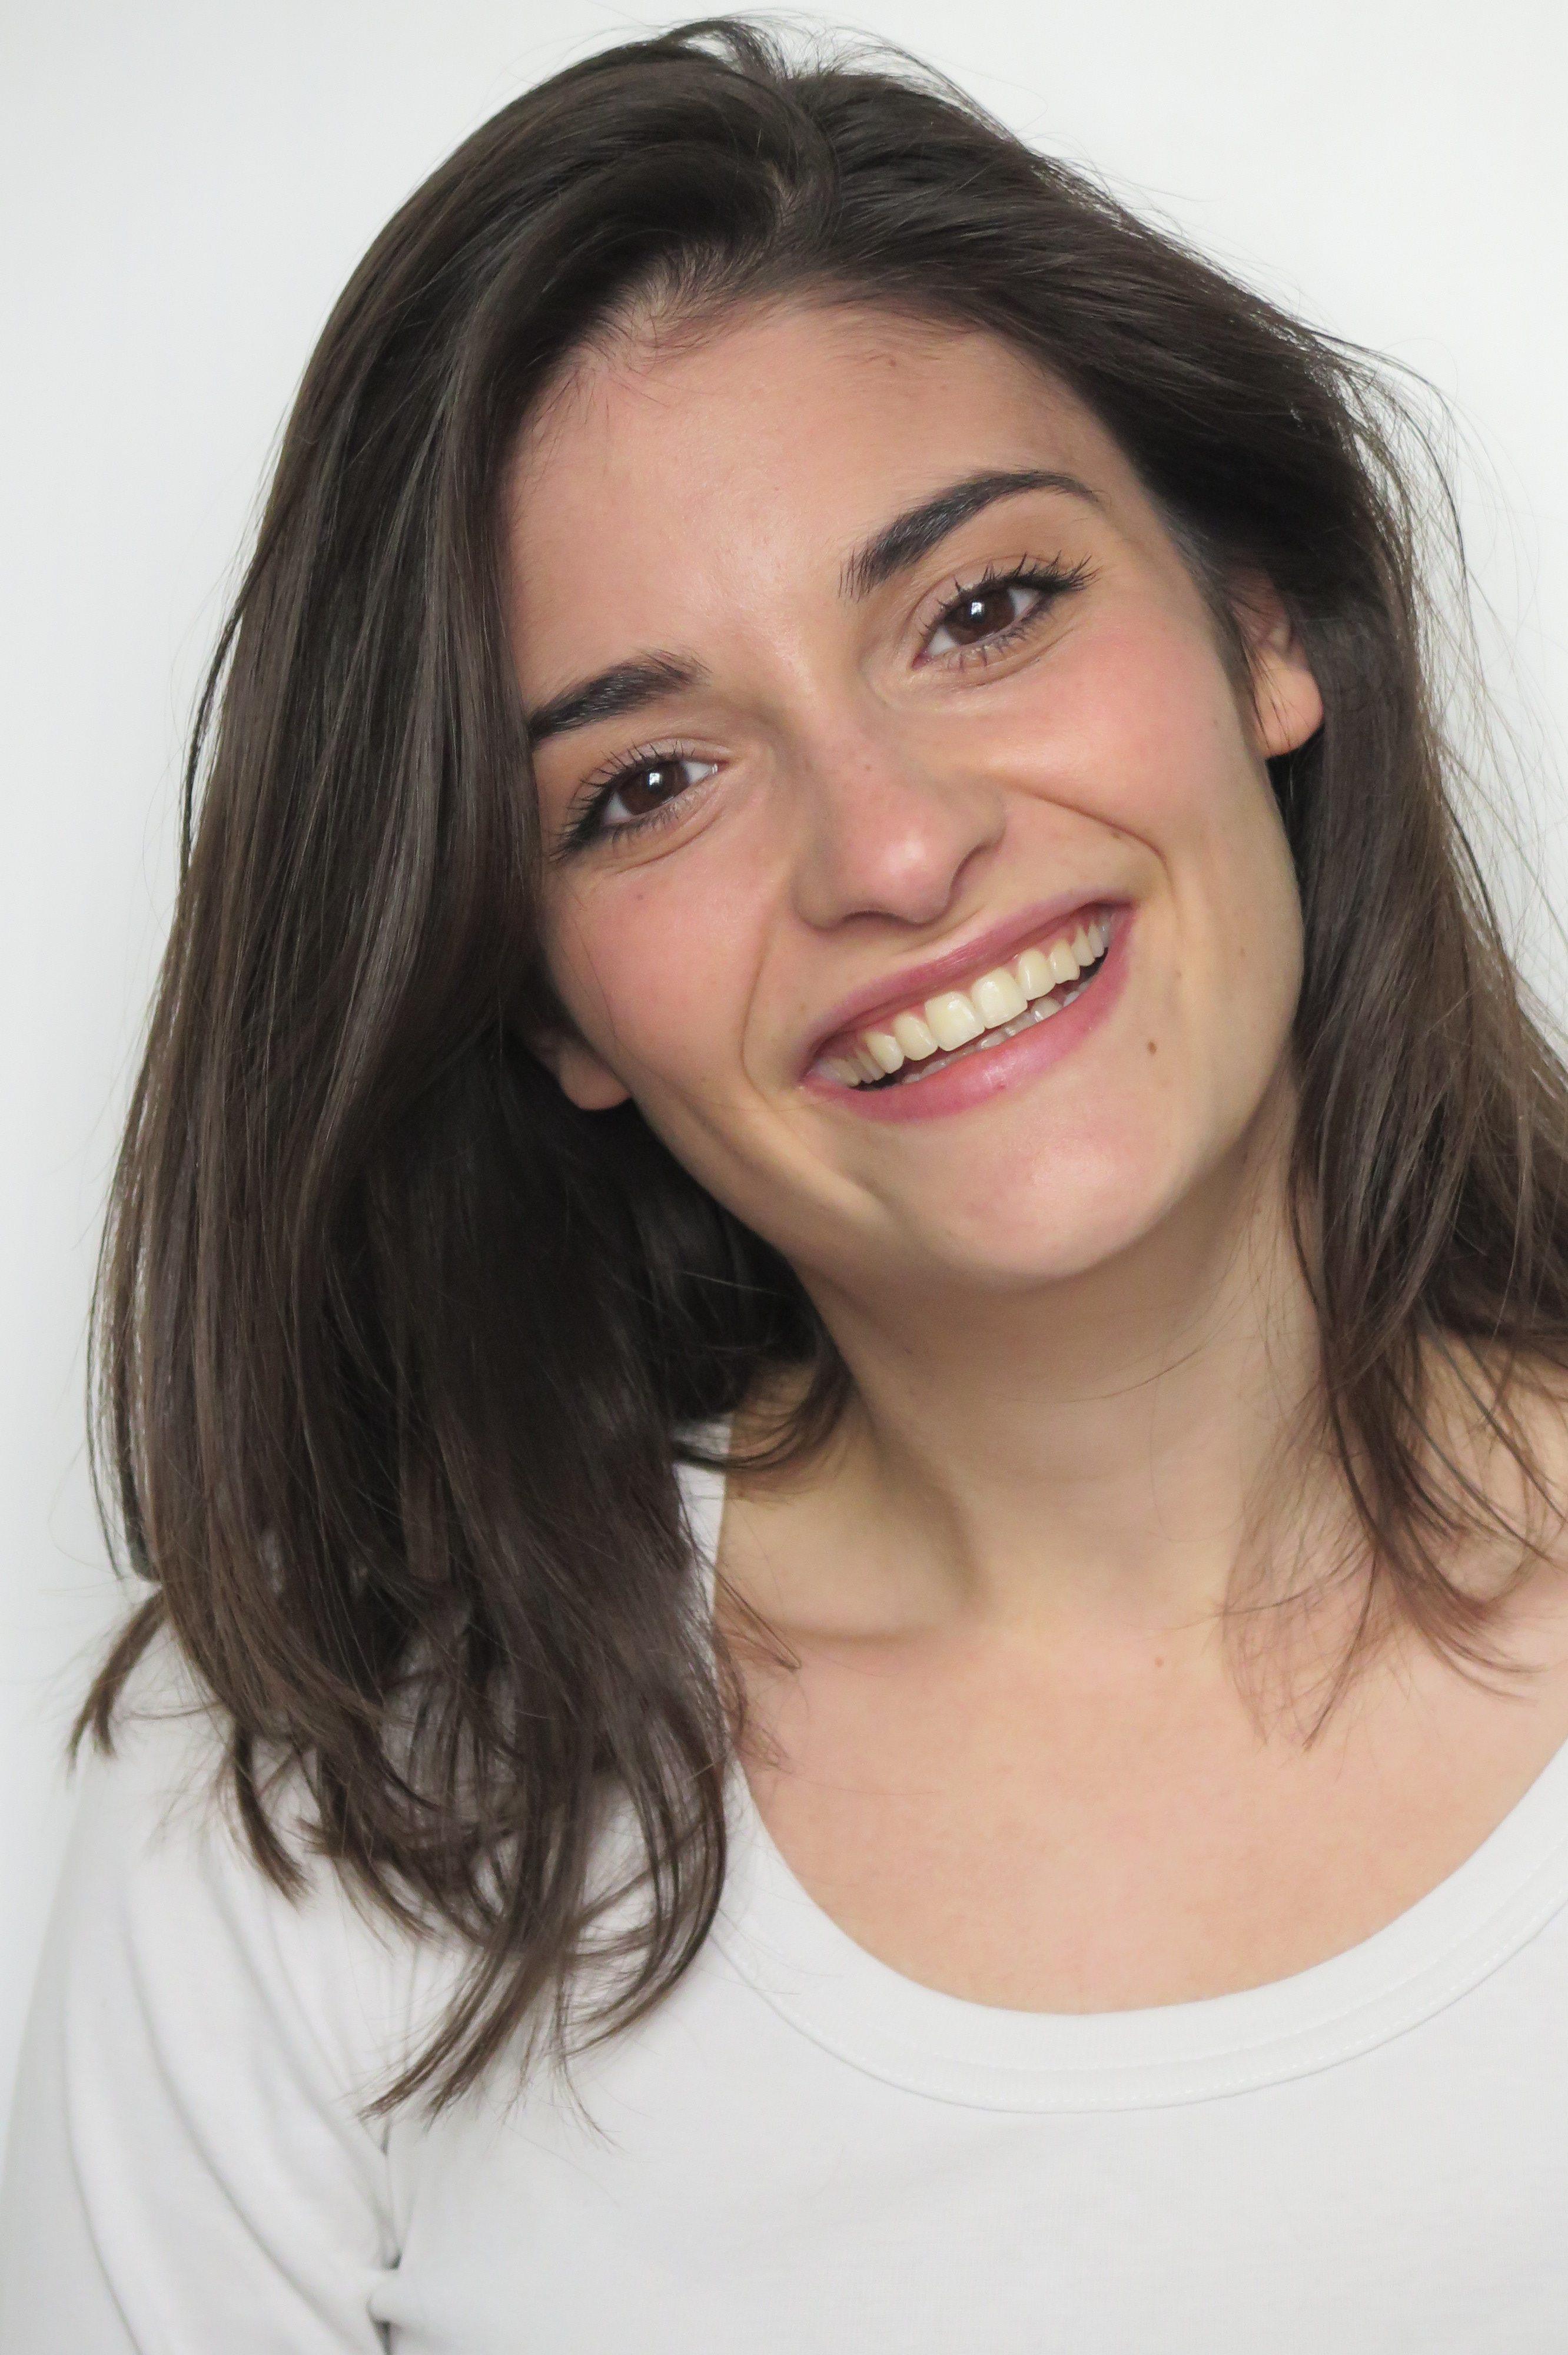 Layla Covino